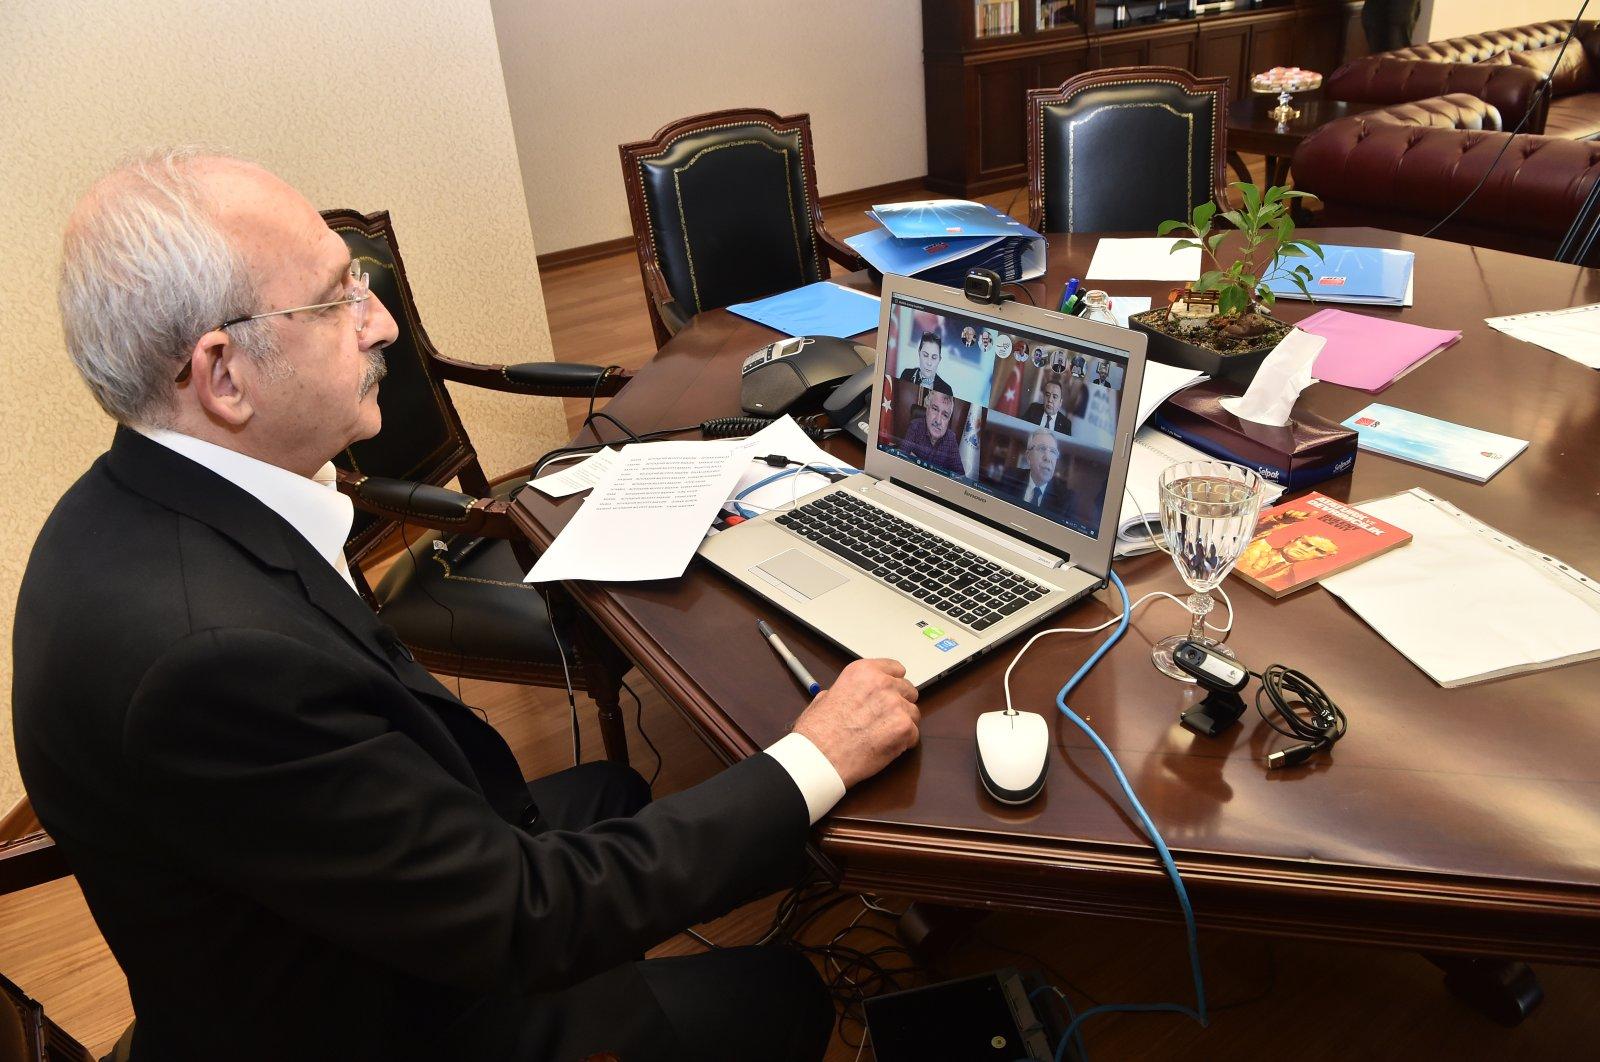 CHP Chairman Kemal Kılıçdaroğlu speaks with mayors in a teleconference meeting on the coronavirus on Saturday, March 21, 2020 (AA Photo)